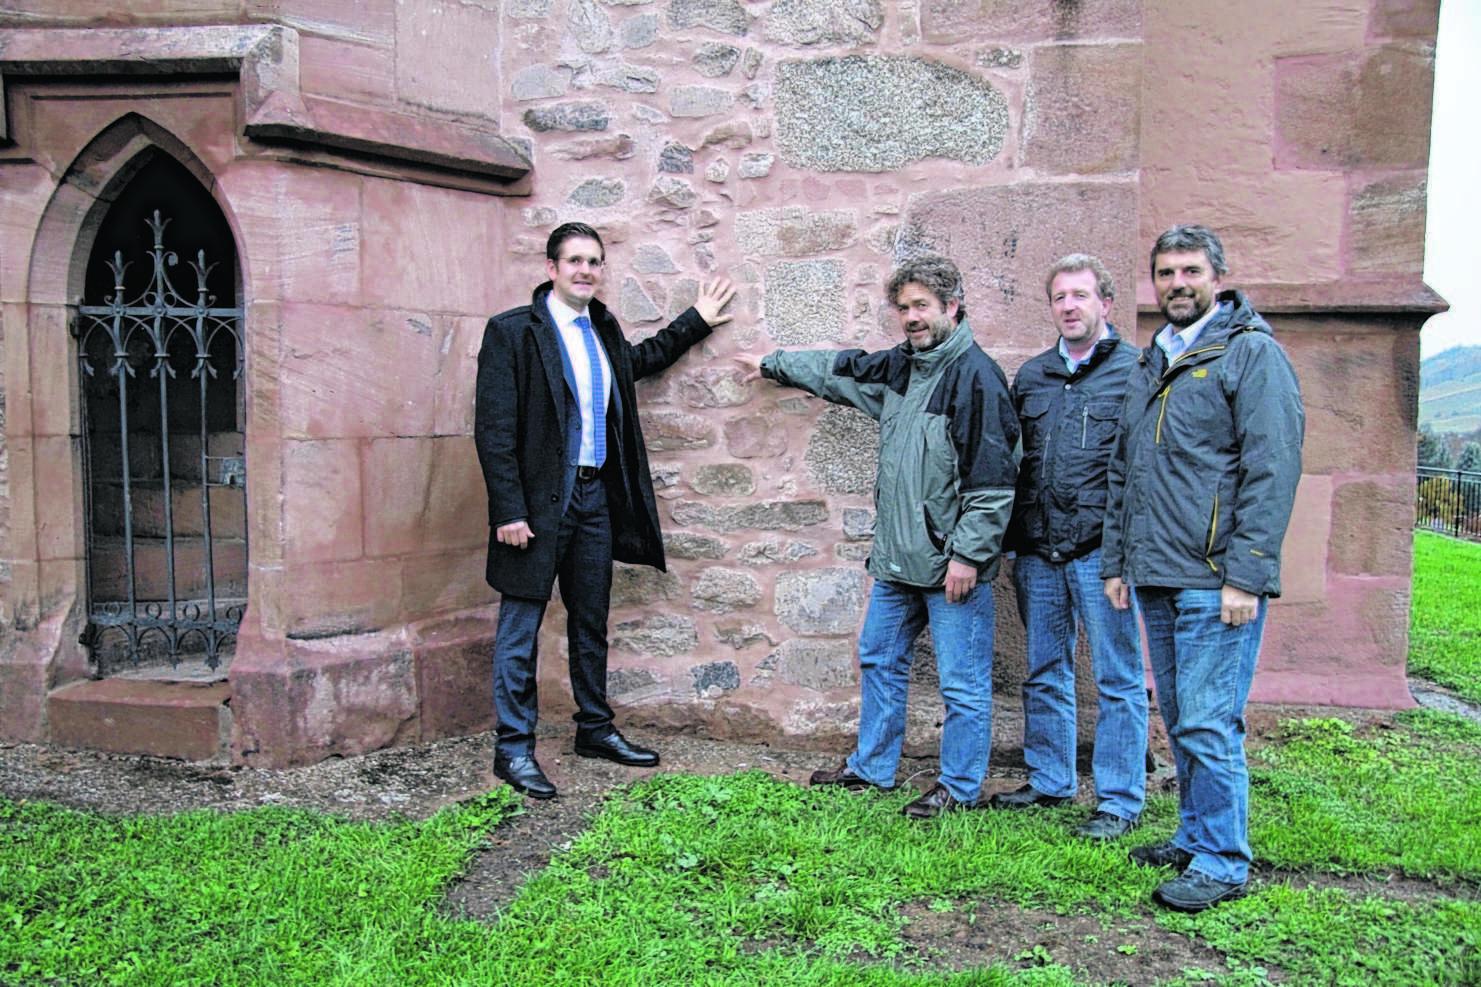 Achern oberkirch kappelrodeck waldulm kirche ist fit f r - Architekt oberkirch ...